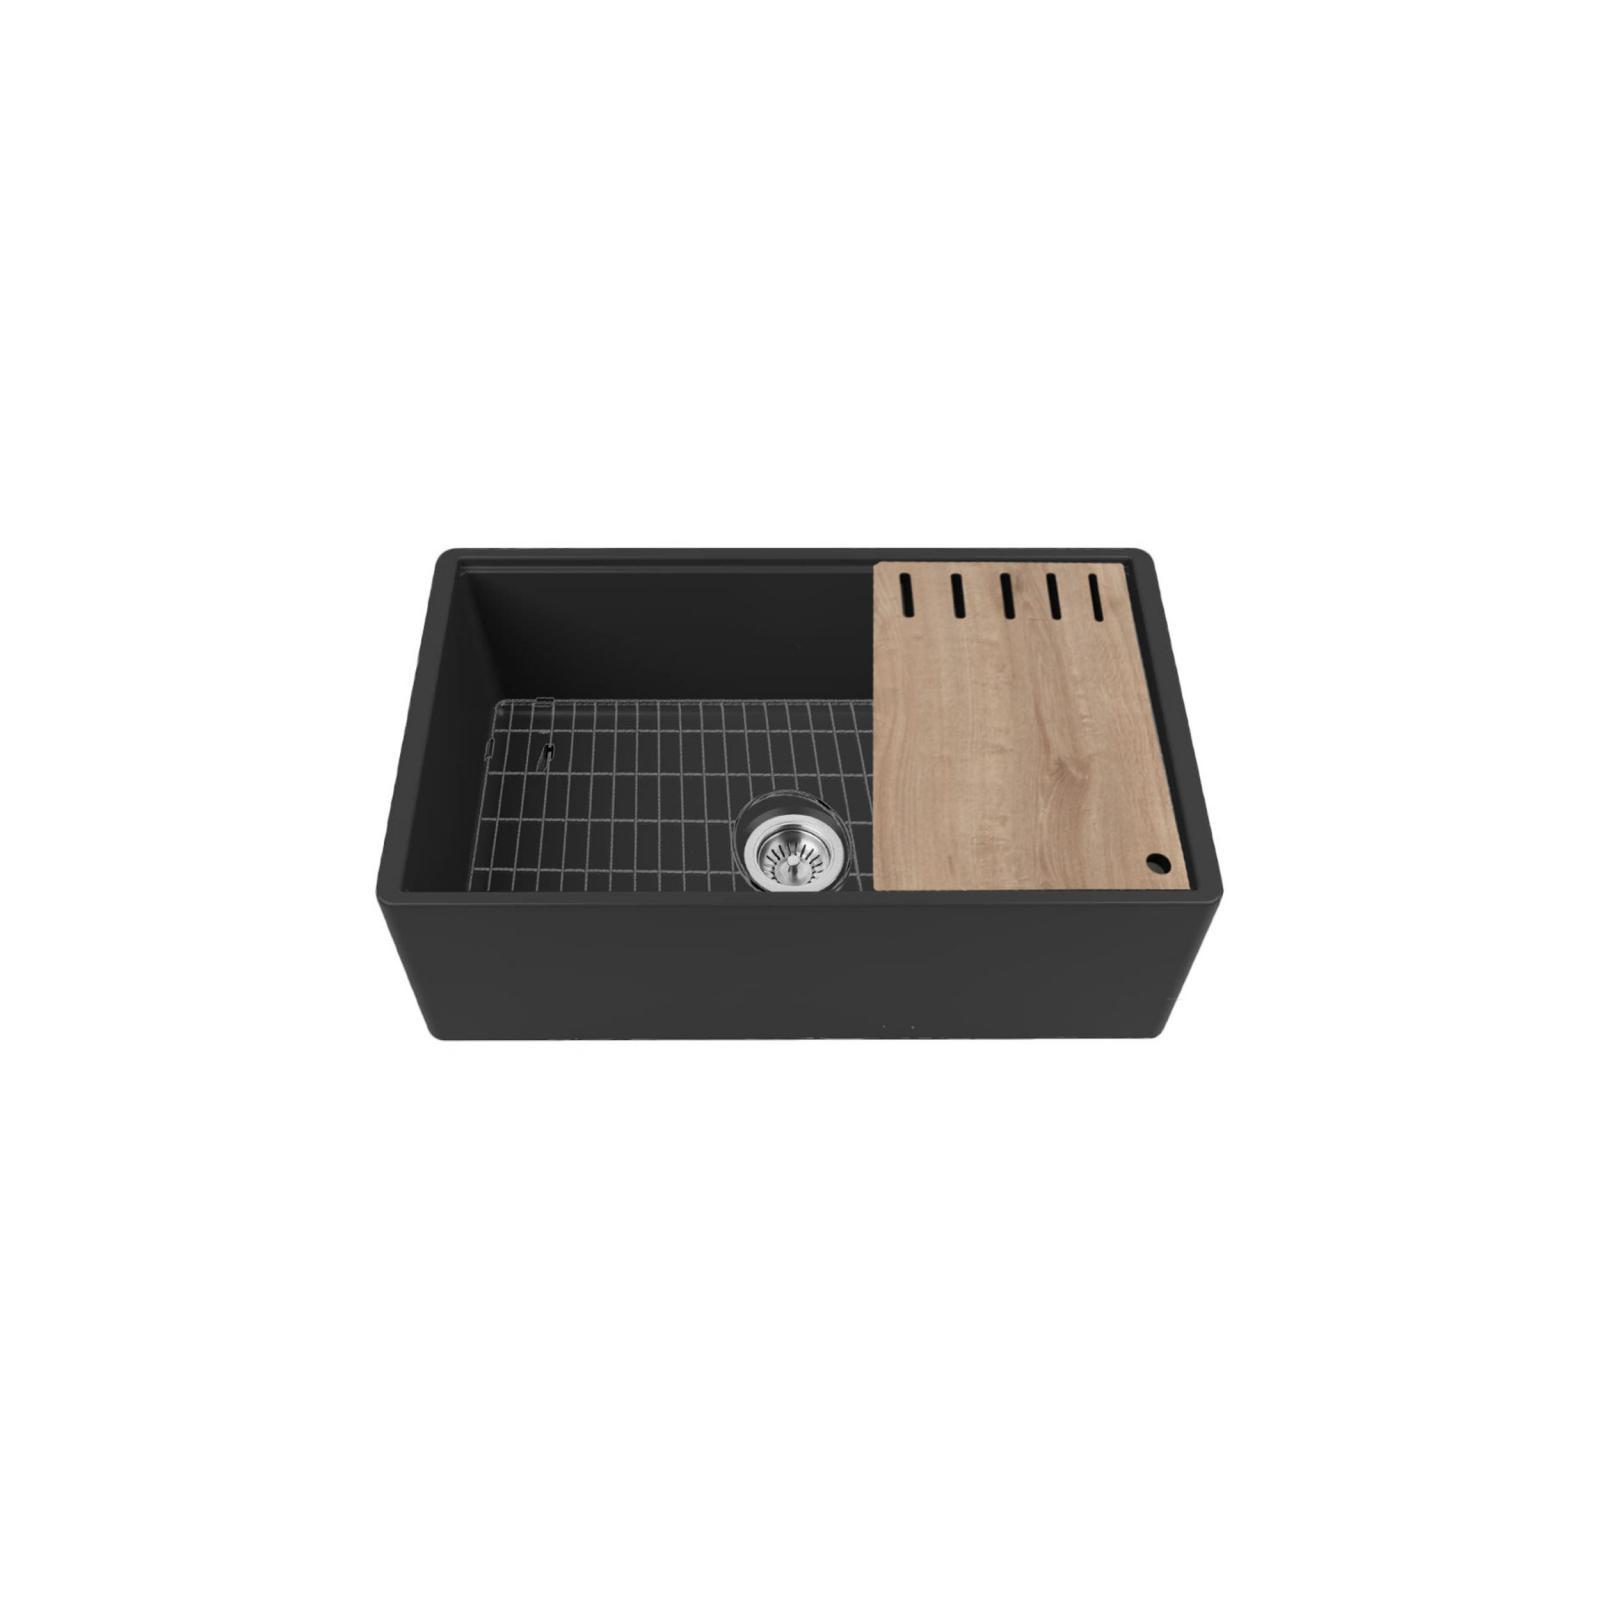 High-quality sink Louis Le Grand I black - single bowl, ceramic - 3